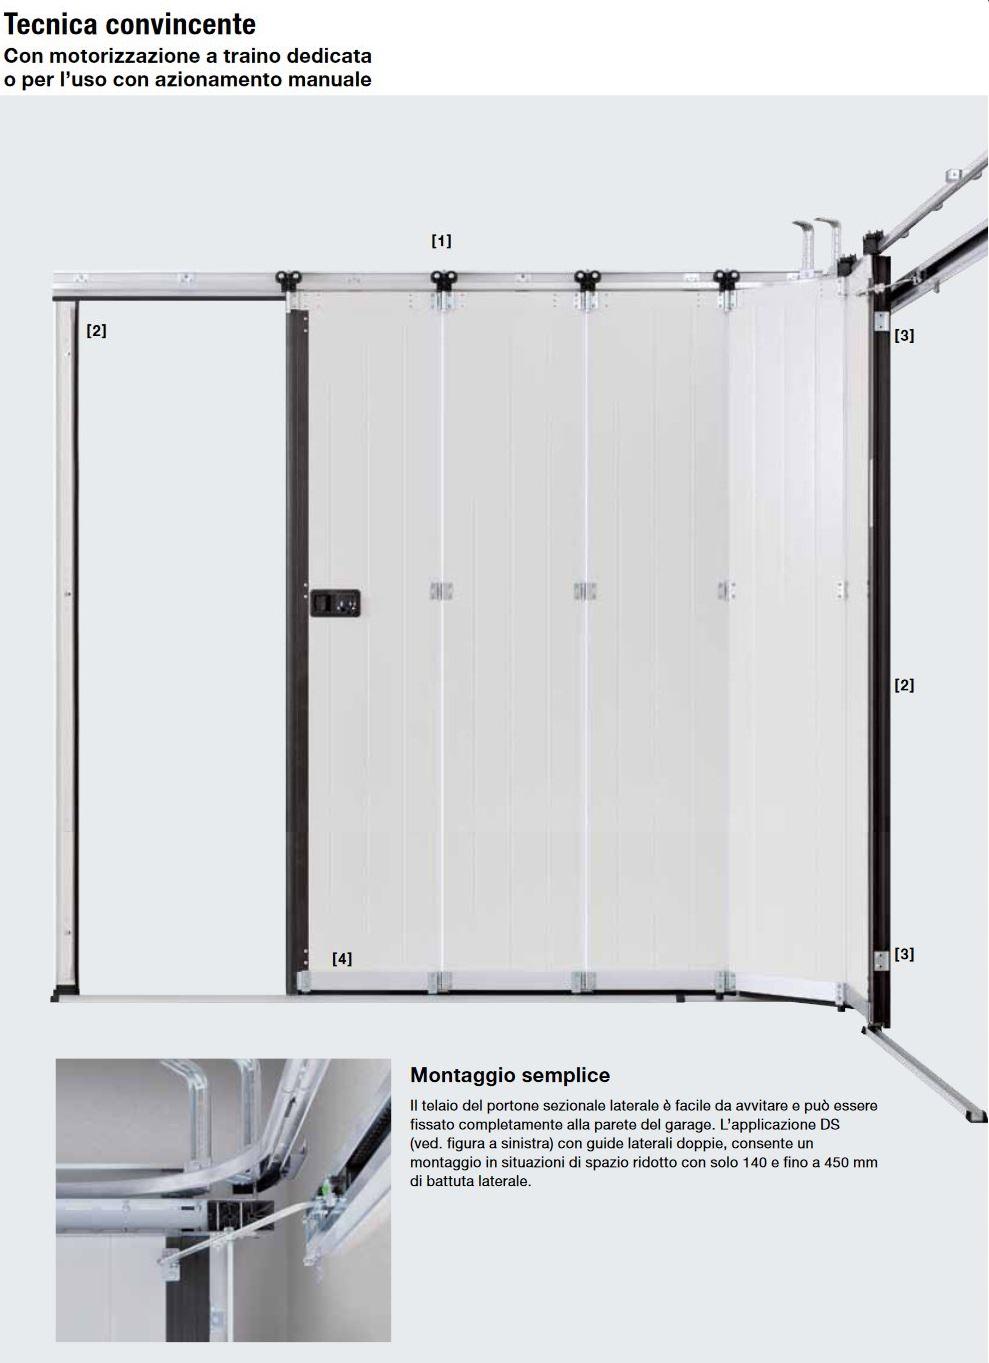 Portone sezionale laterale hst hormann maffei sistemi - Portone sezionale laterale prezzi ...